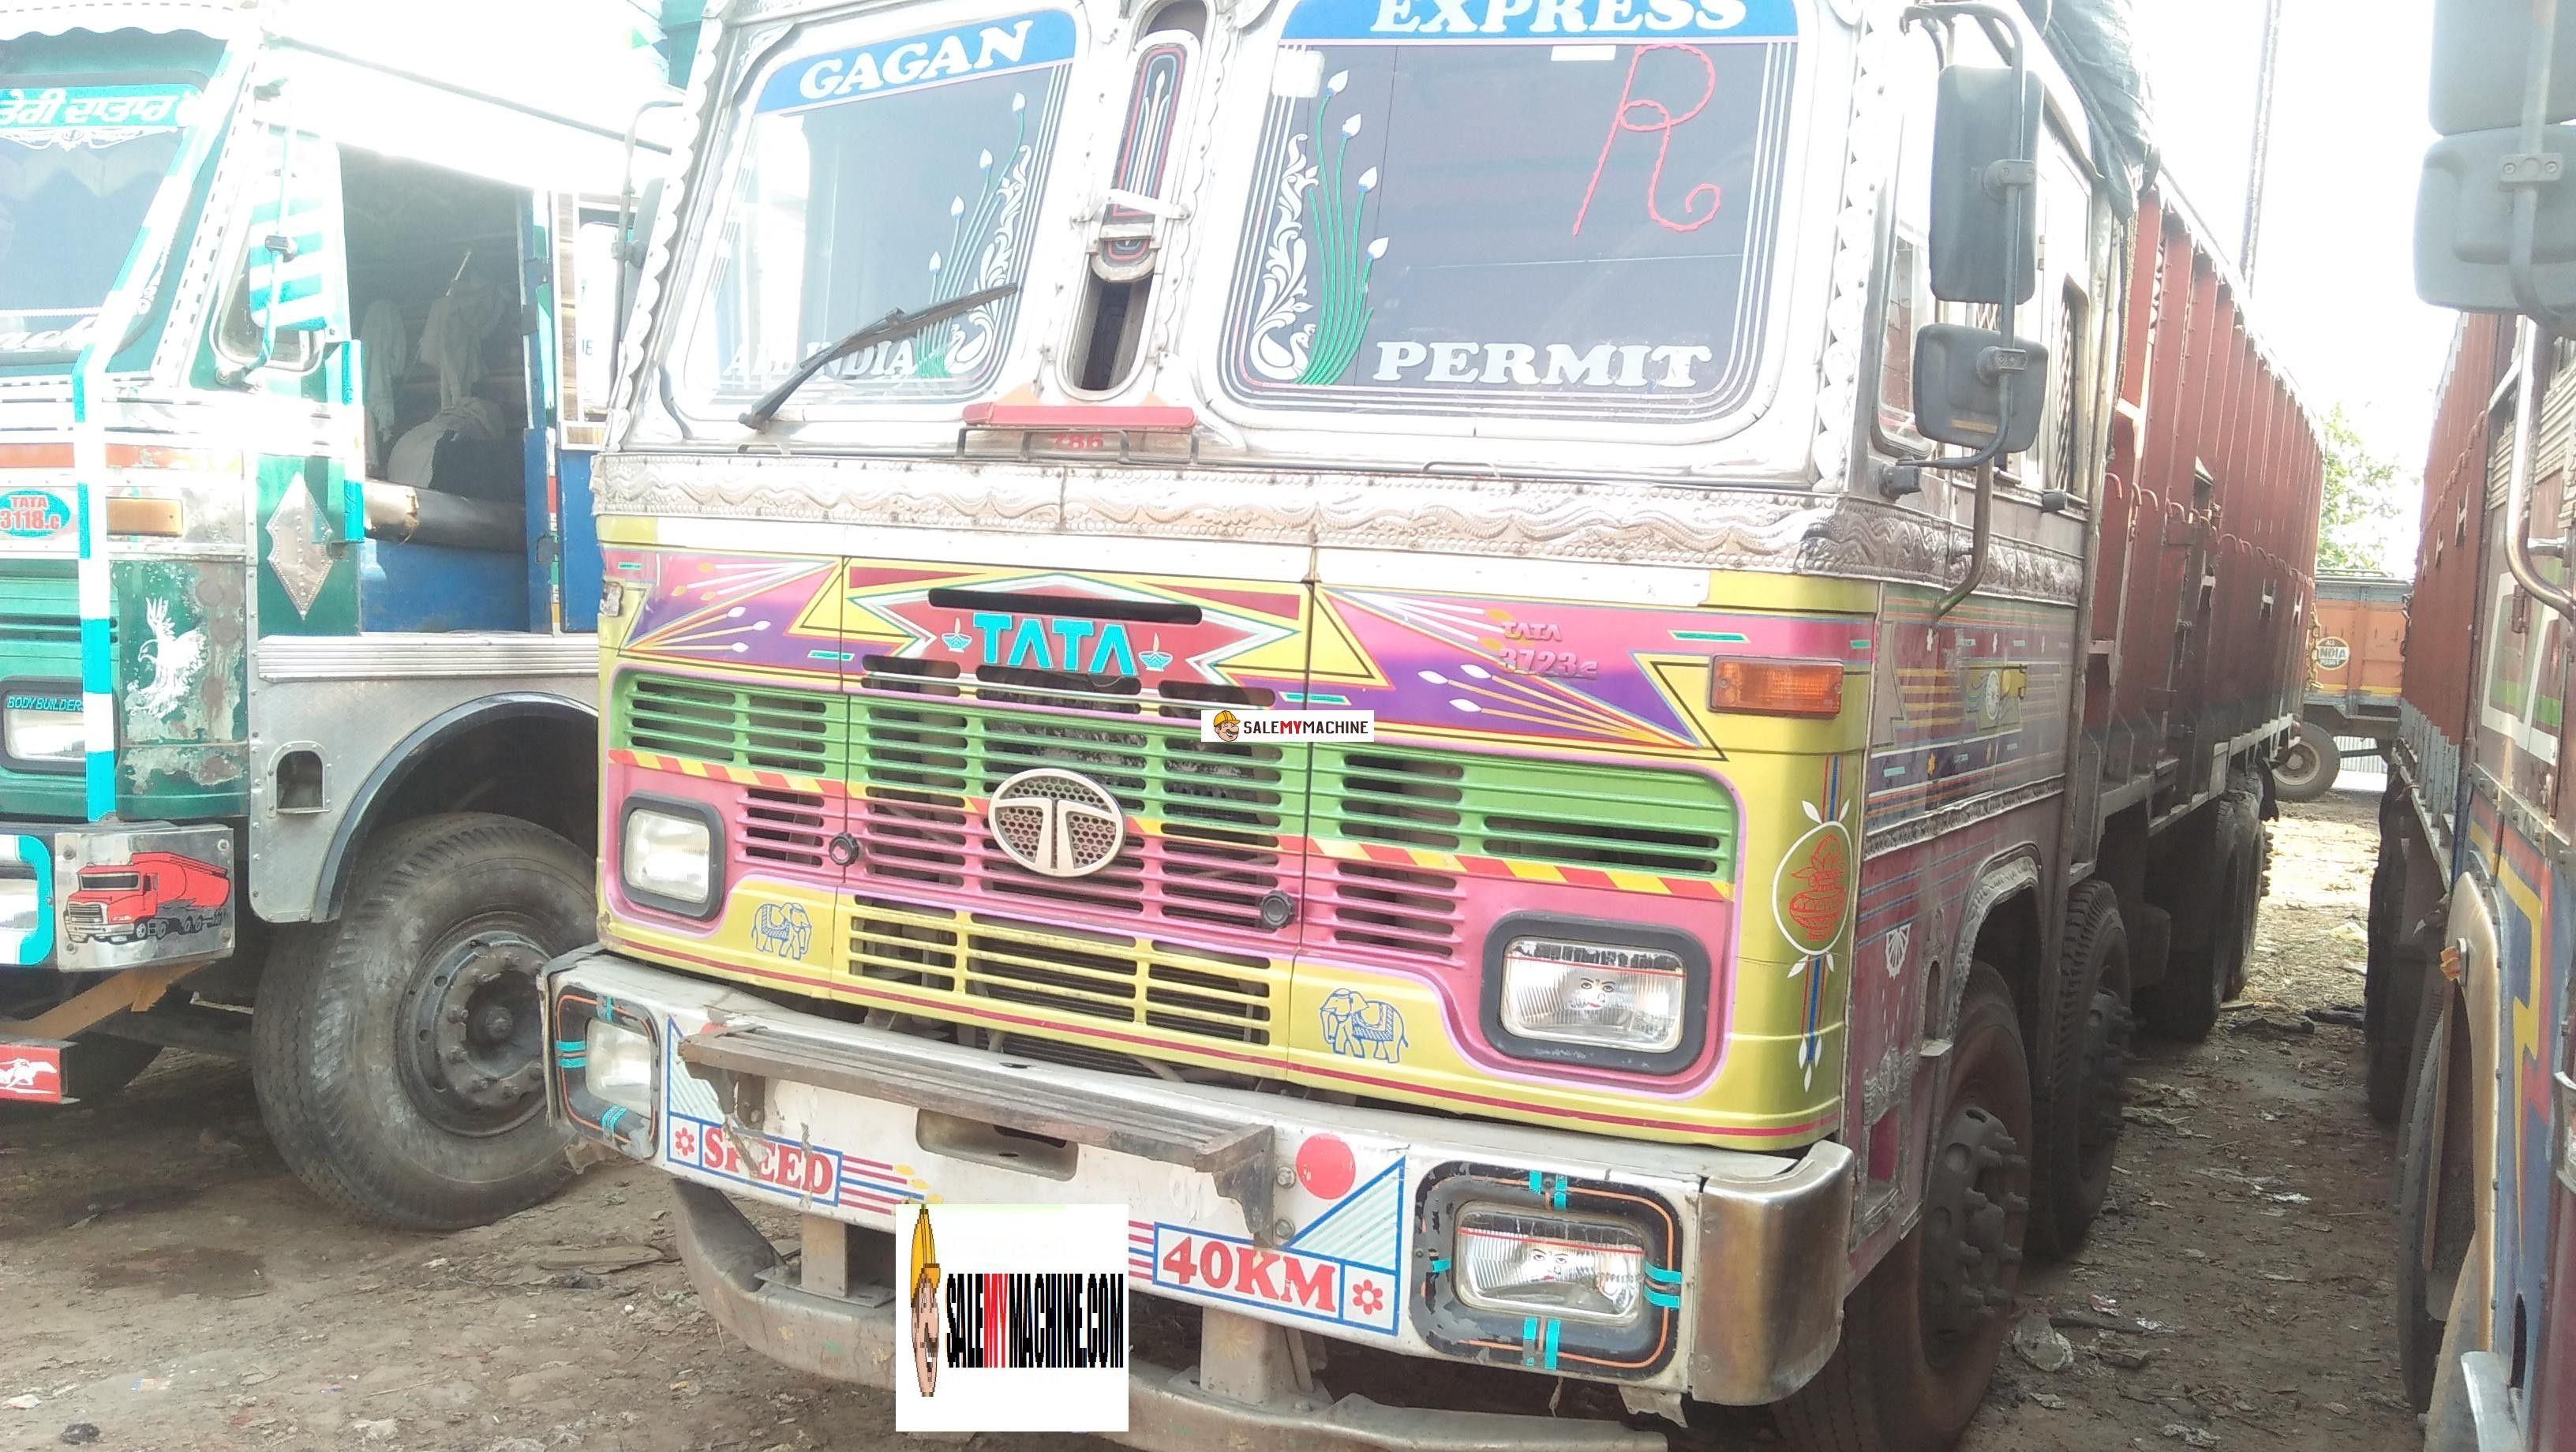 Used 18 Wheelers For Sale >> Used Tata 14 Wheeler Truck For Sale In Odisha India At